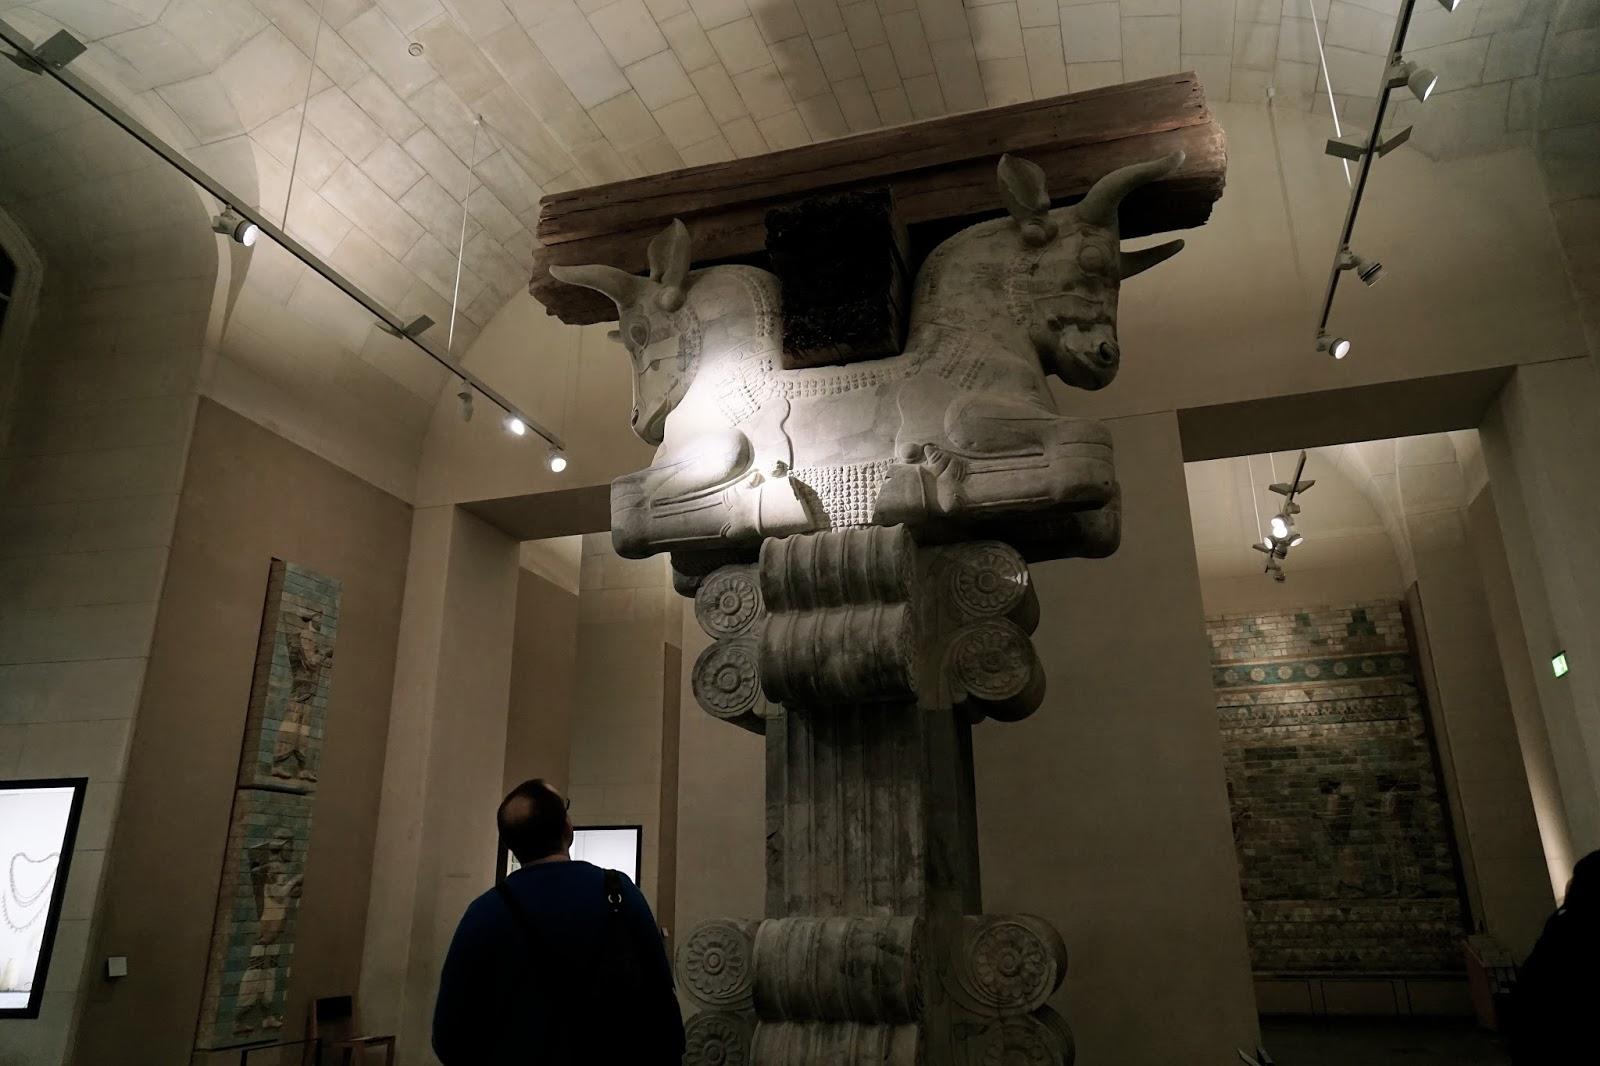 「アパダーナの柱頭」  (Chapiteau d'une colonne de la salle d'audiences (Apadana) du Palais de Darius Ier)